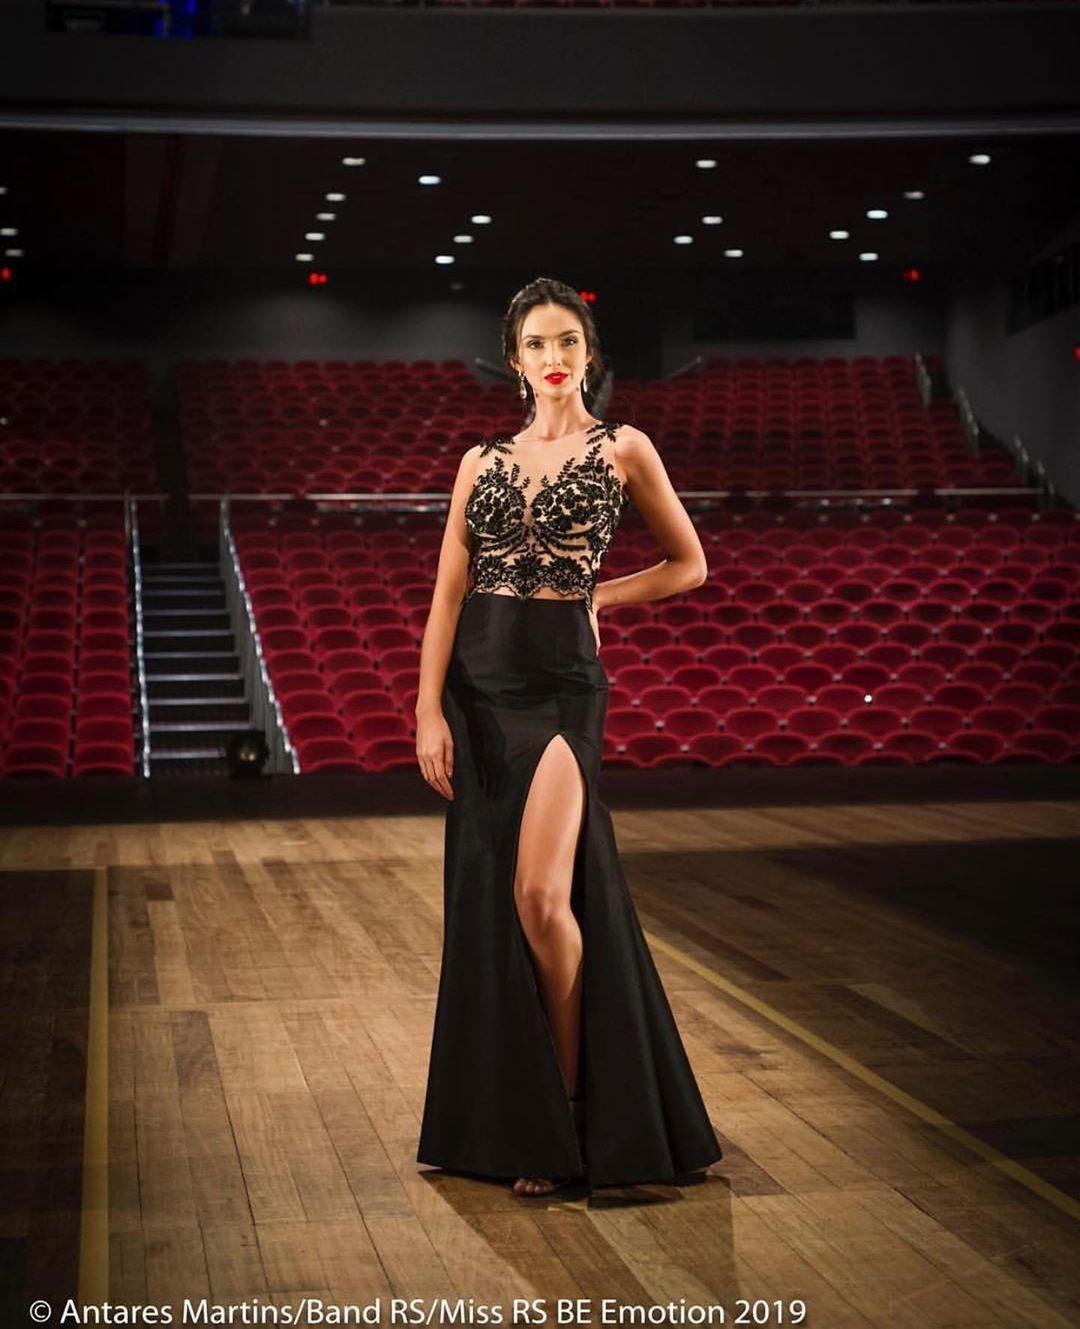 bianca scheren, top 5 de miss brasil universo 2019. - Página 3 49815610